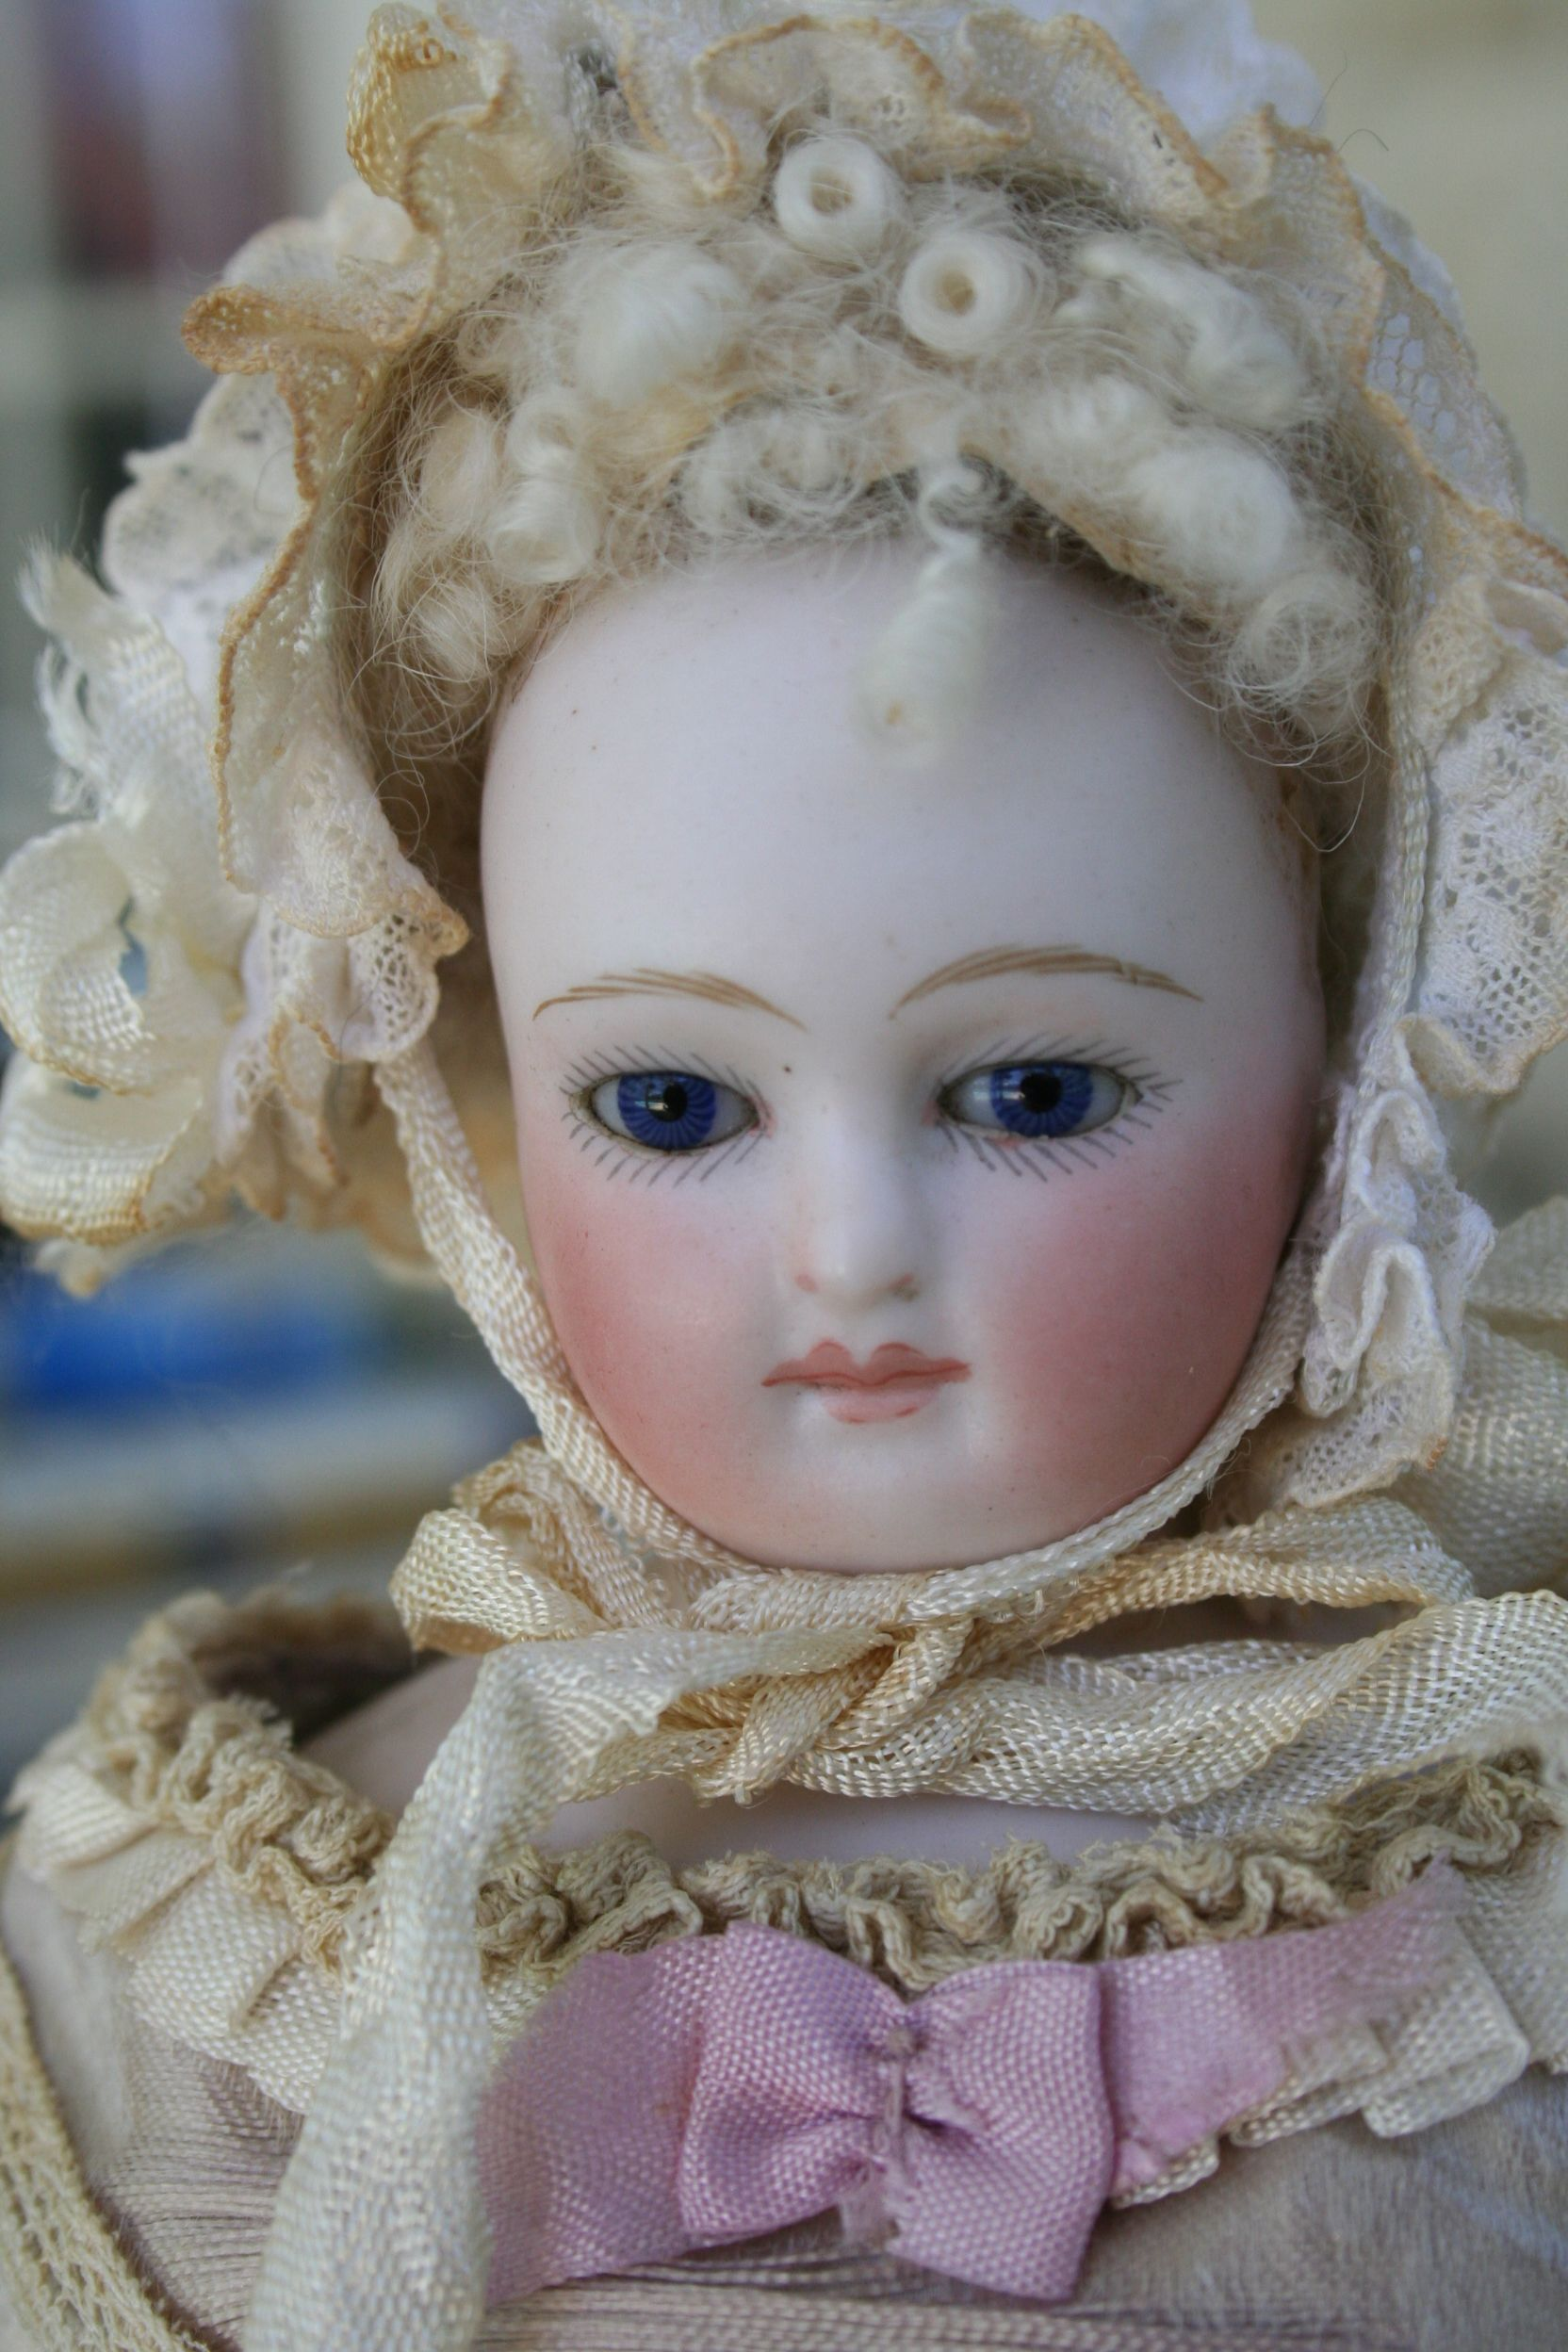 Early Barrois French Fashion Doll sold by Signature Dolls #DollShopsUnited